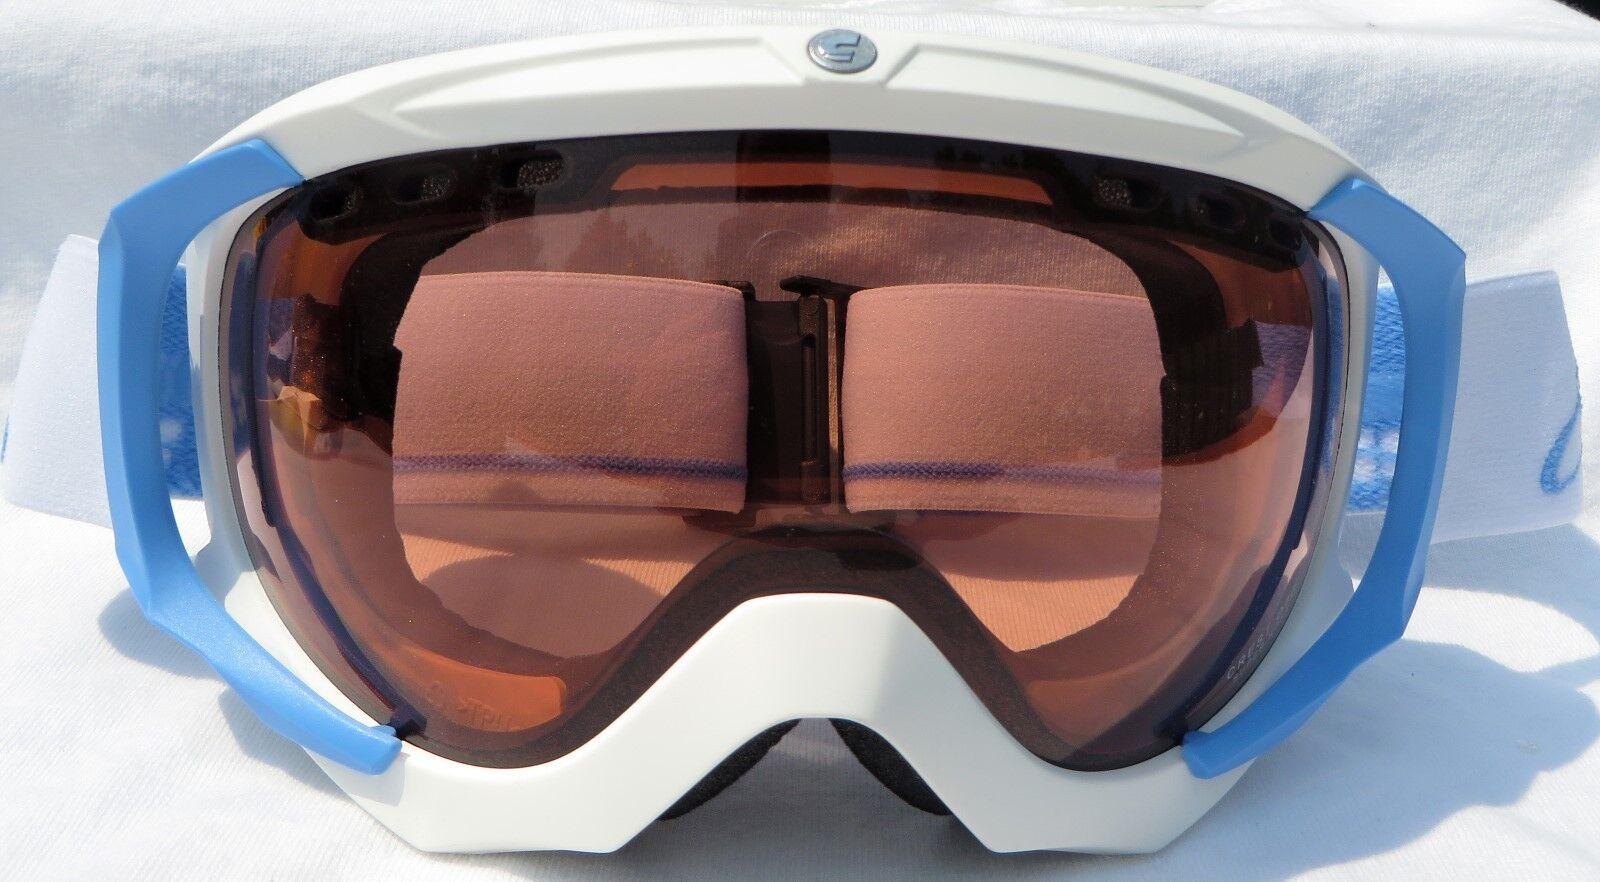 Carrera Mens Crest White bluee OTG Fit Over Glasses Goggles pink Spy Lens